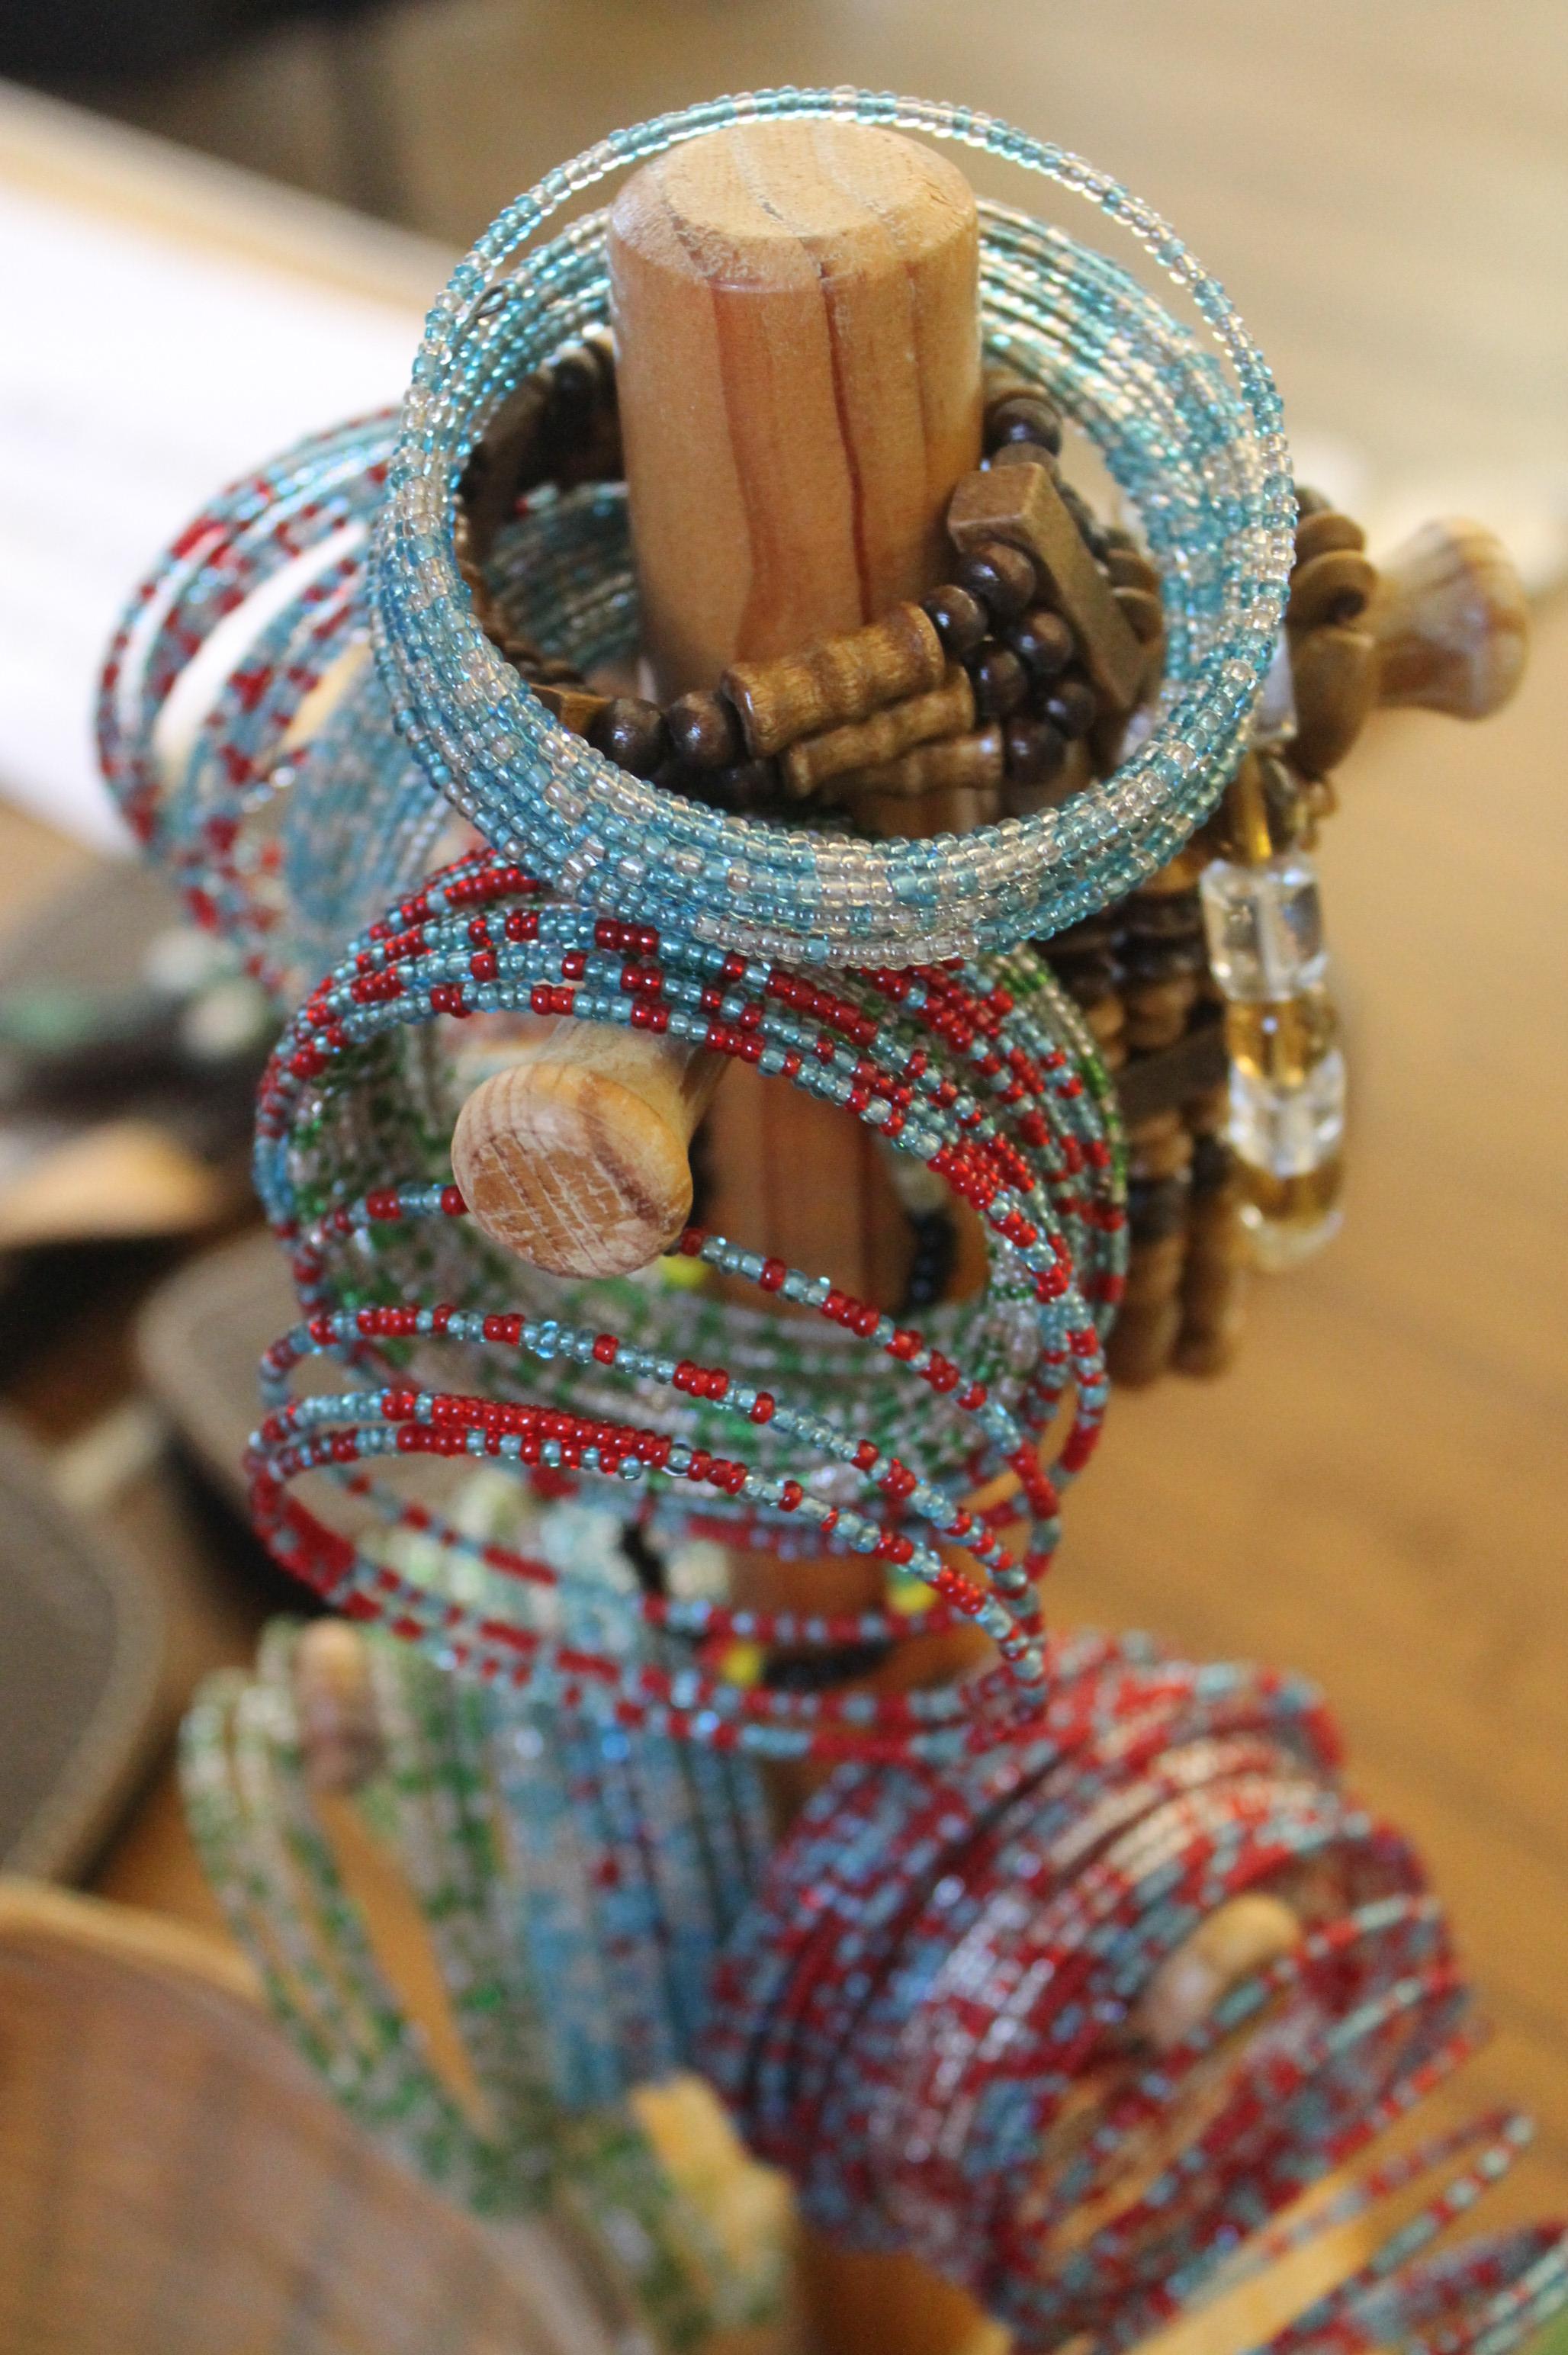 Intricate beaded bracelets